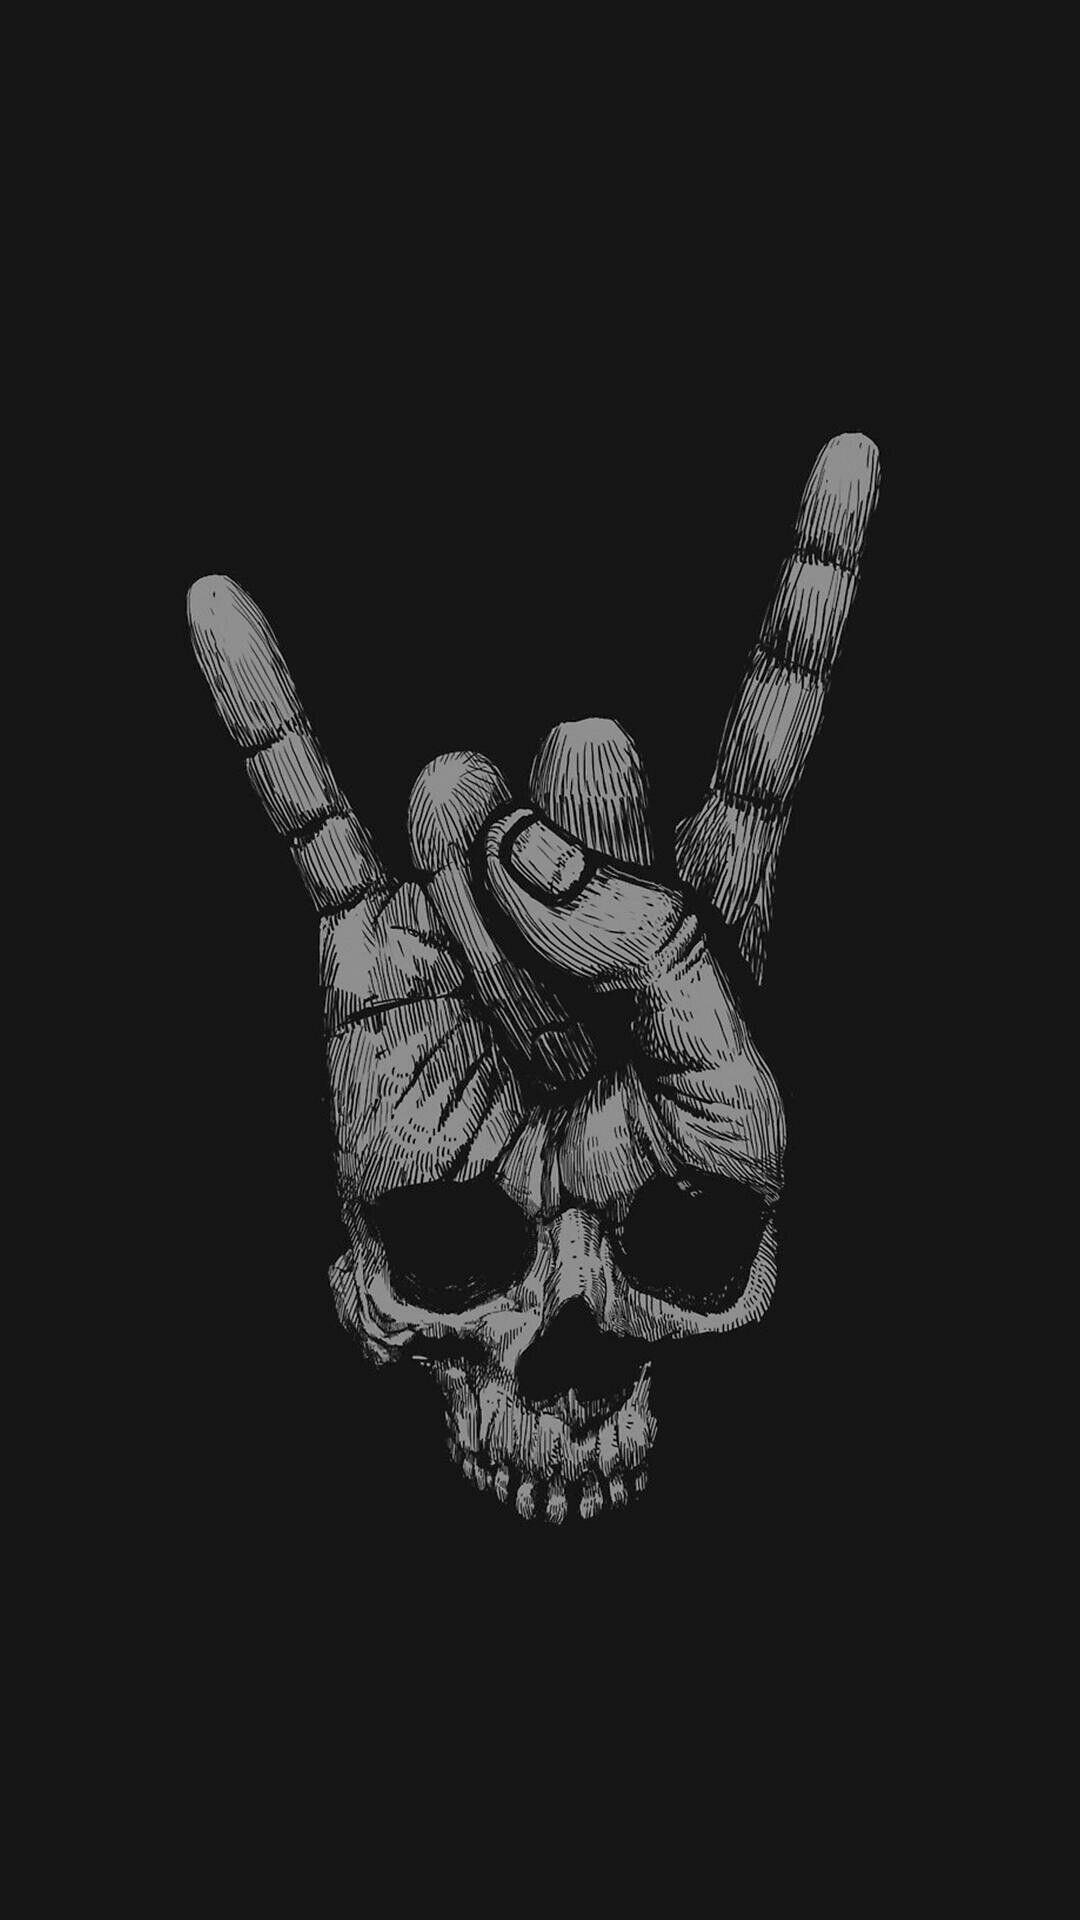 Fond D Écran Tatouage pintravis merritt on skulls in 2018 | pinterest | Écran, dessin